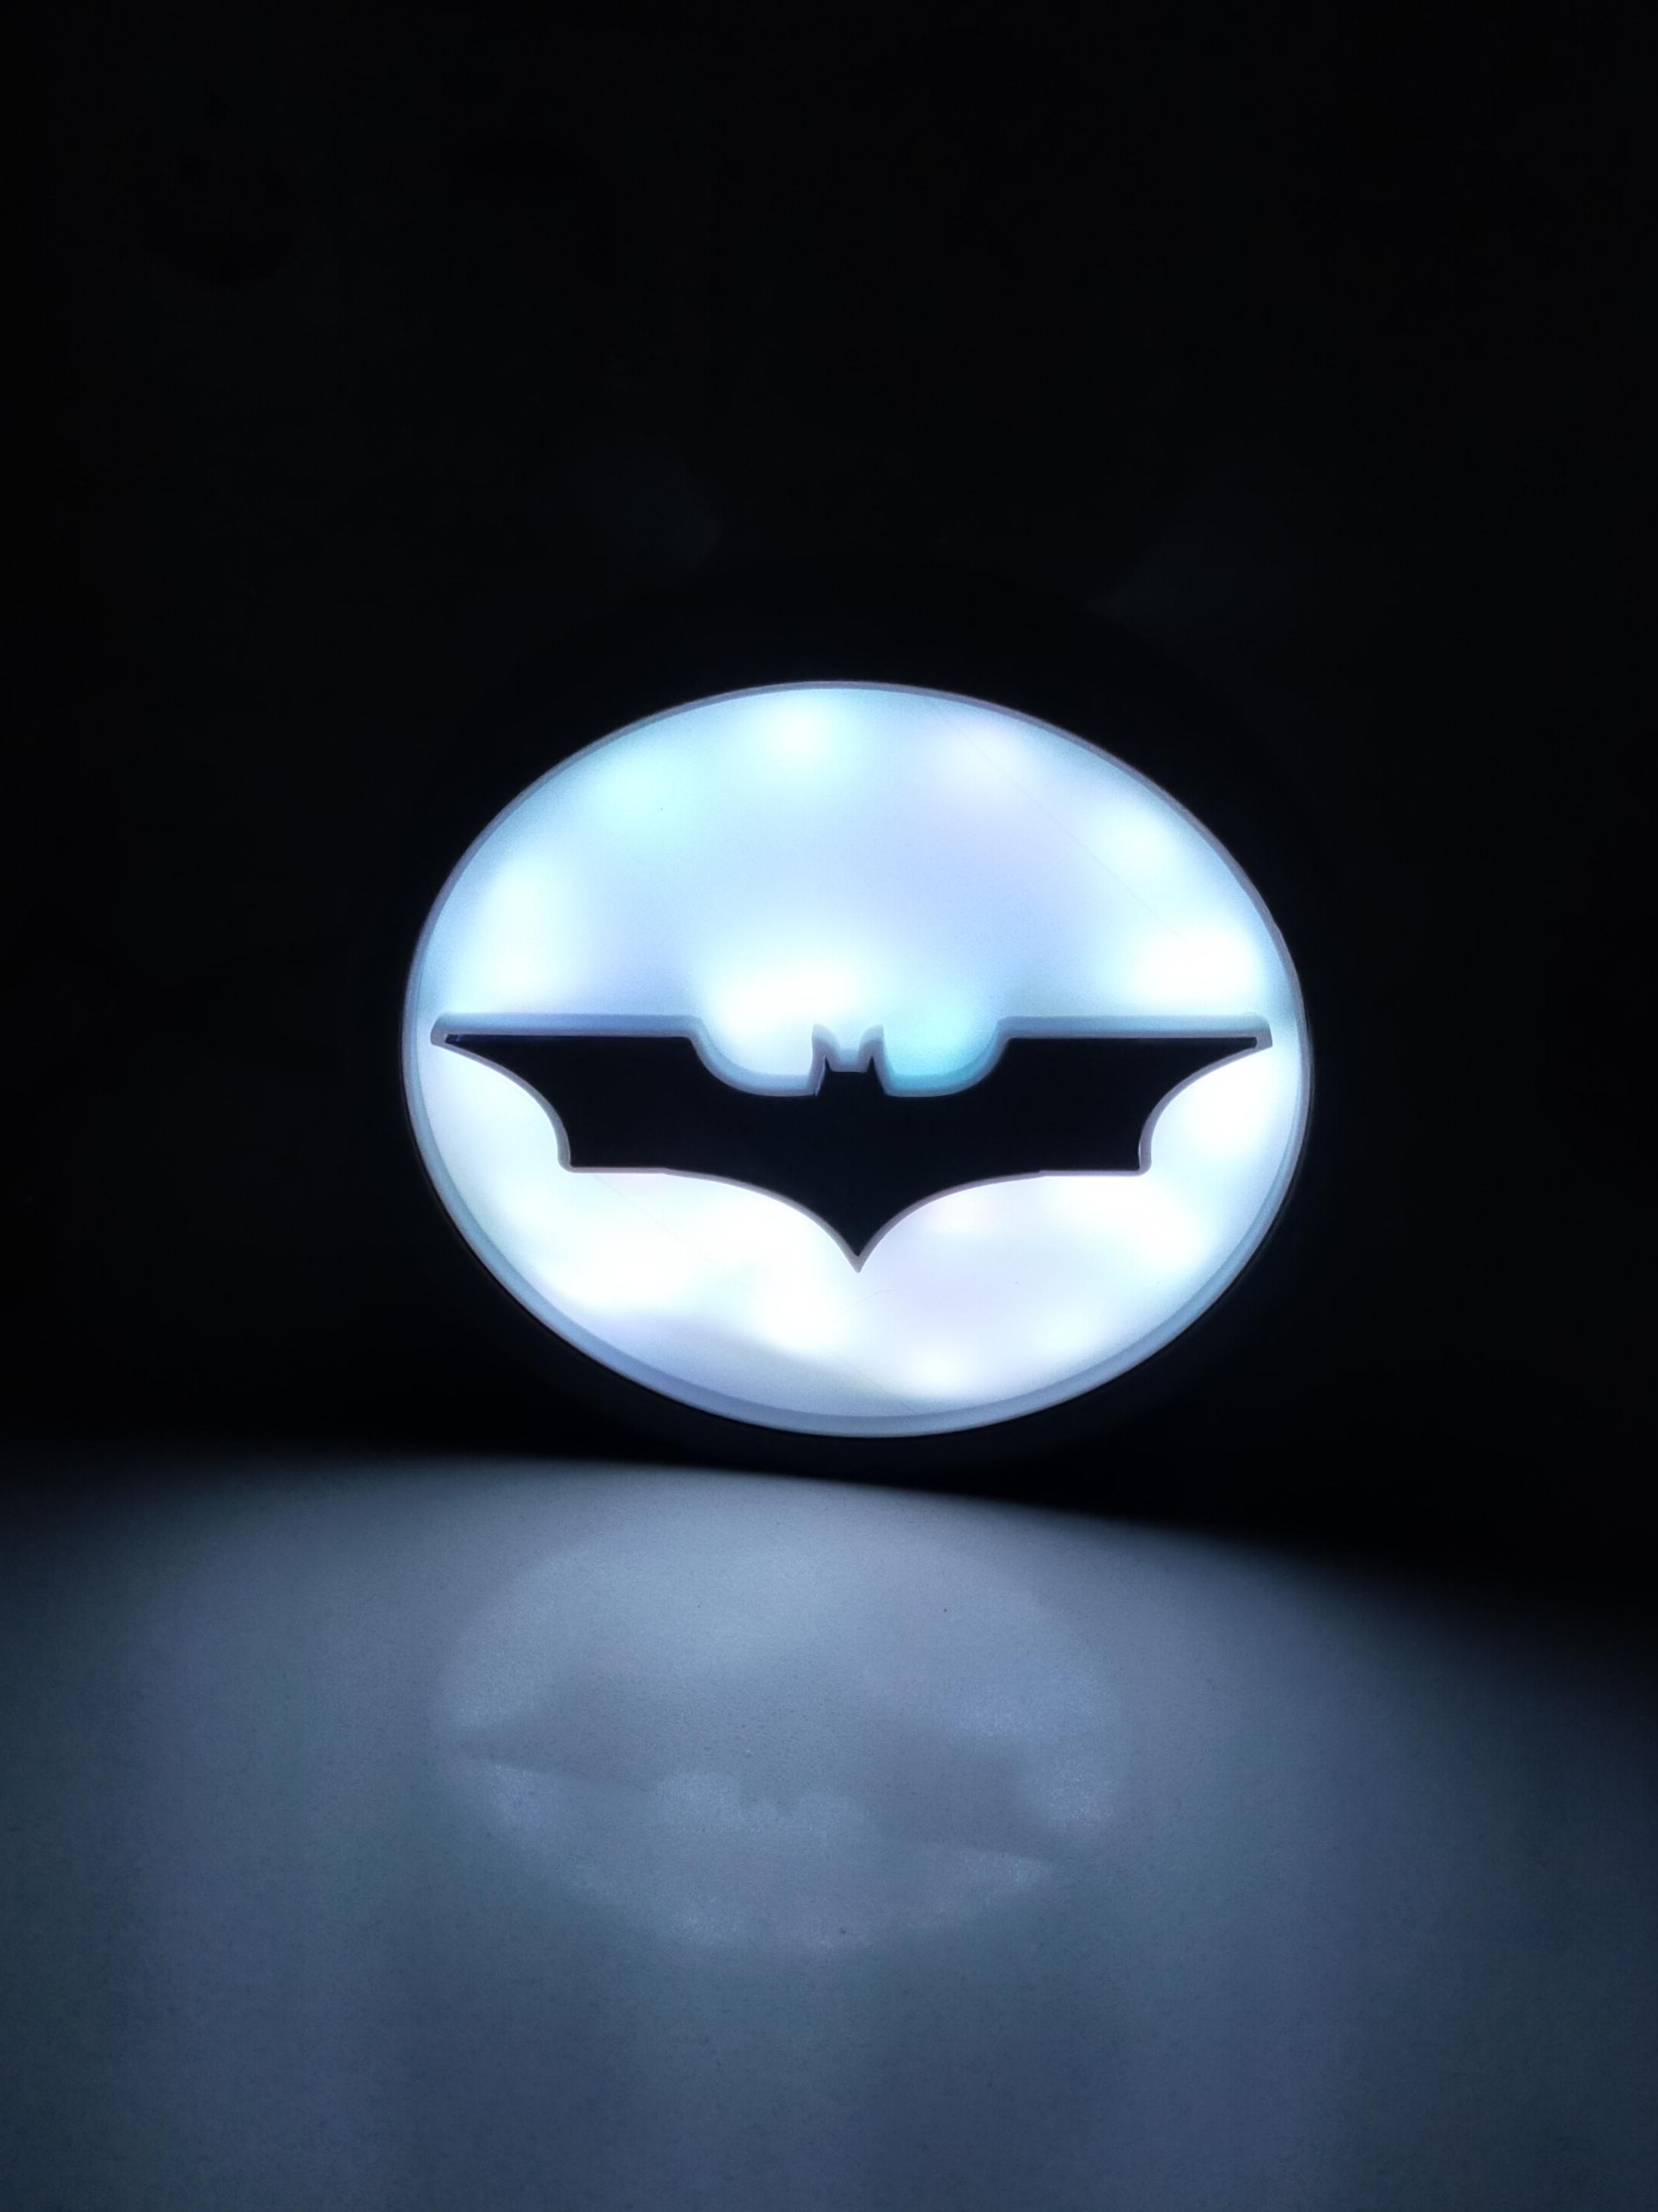 IMG_20210113_212716.jpg Download STL file ILLUMINATED SIGN BATMAN BATSIGNAL • 3D printer model, librexviii